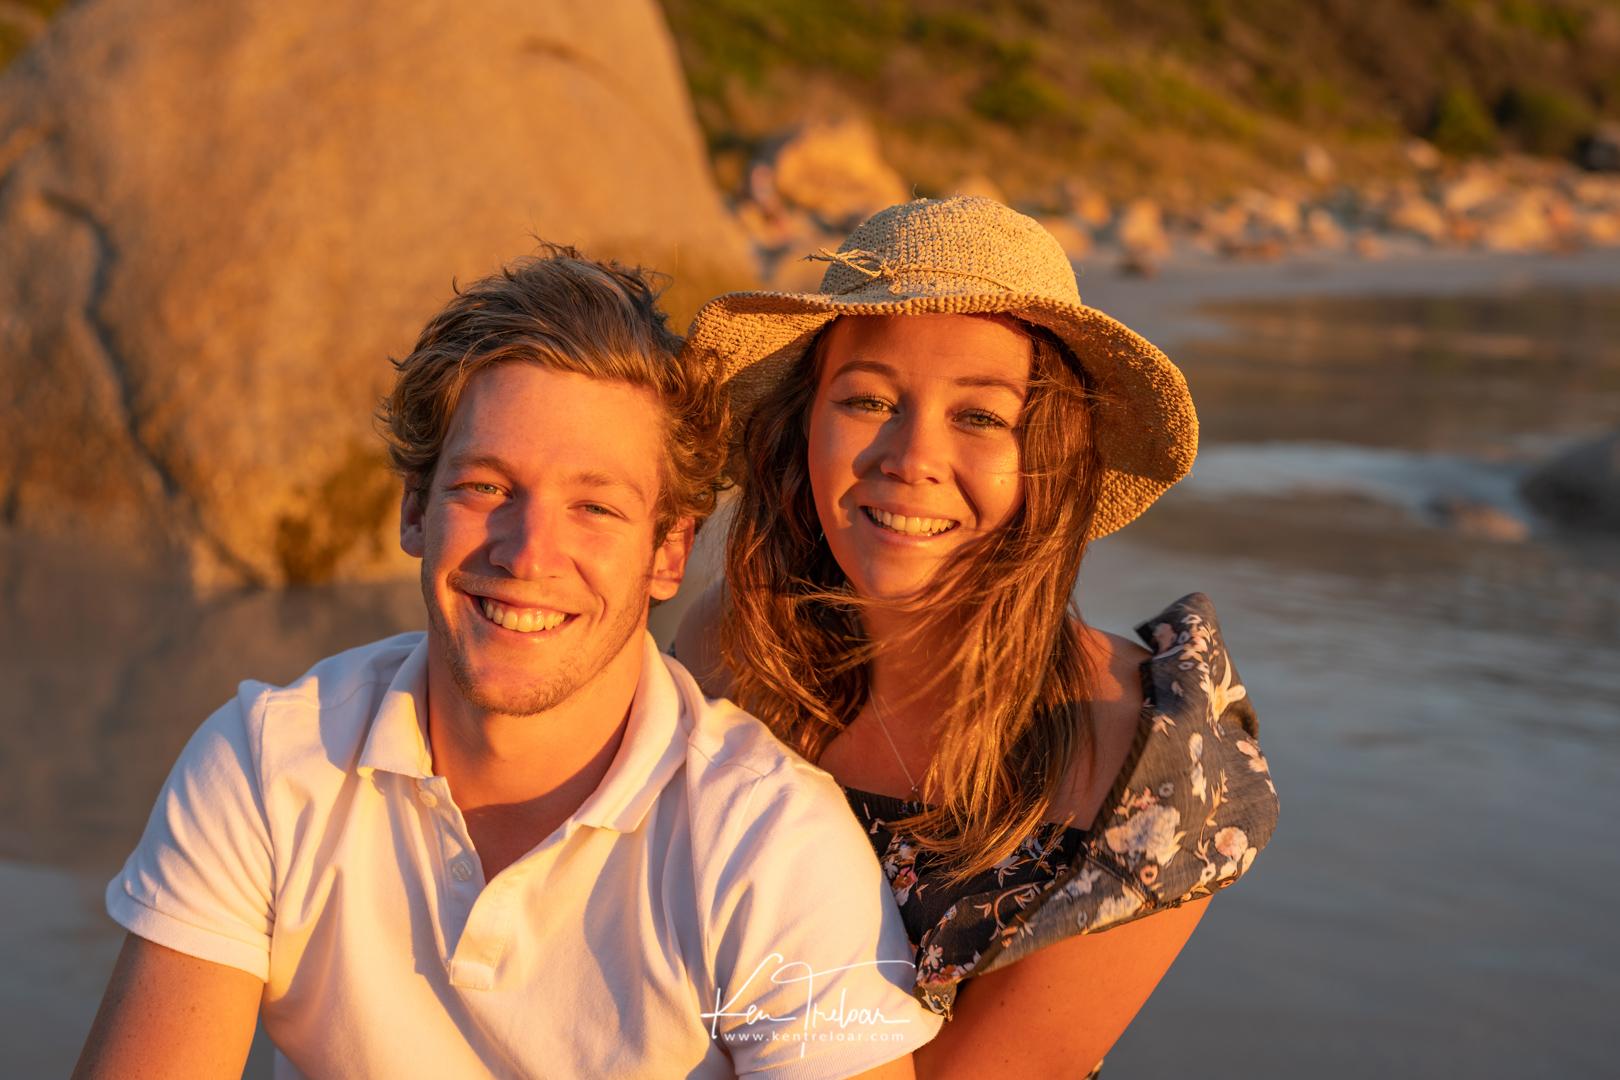 Ken Treloar Photography - _Llandudno_Sunset Couples Session 2019-4.jpg